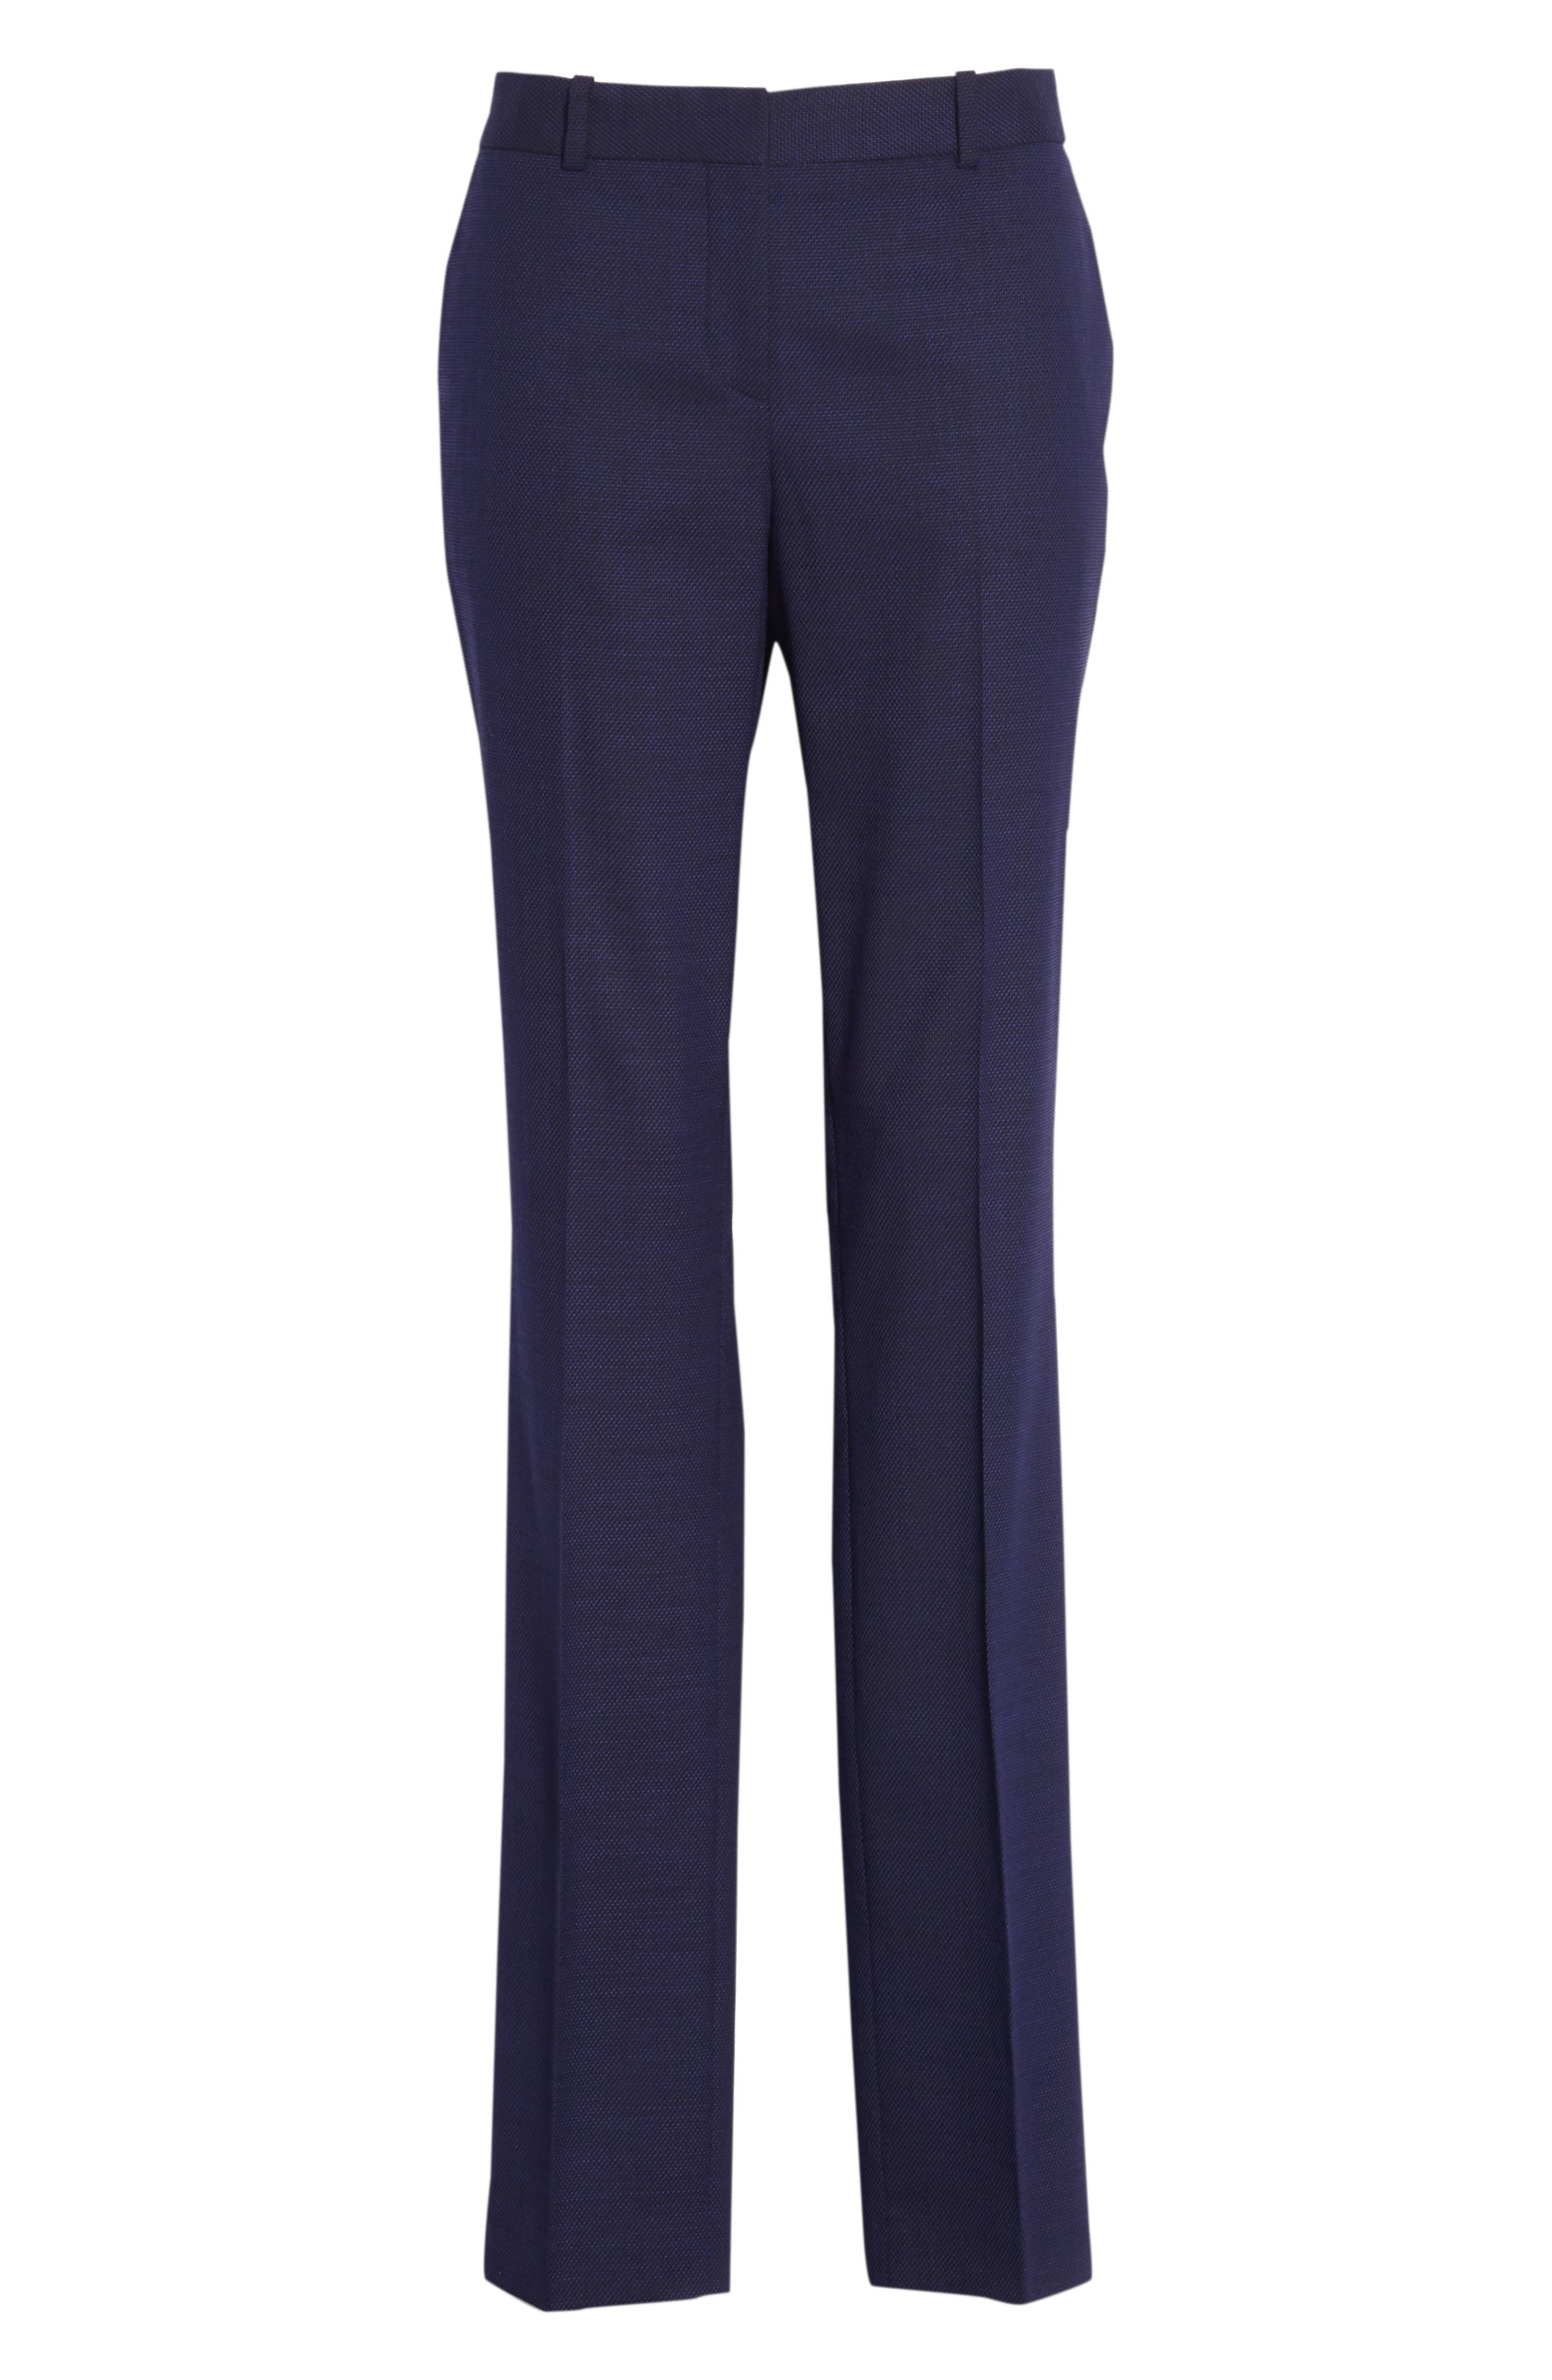 Titana Mini Glencheck Straight Leg Suit Pants,                             Alternate thumbnail 7, color,                             Deep Lilac Fantasy